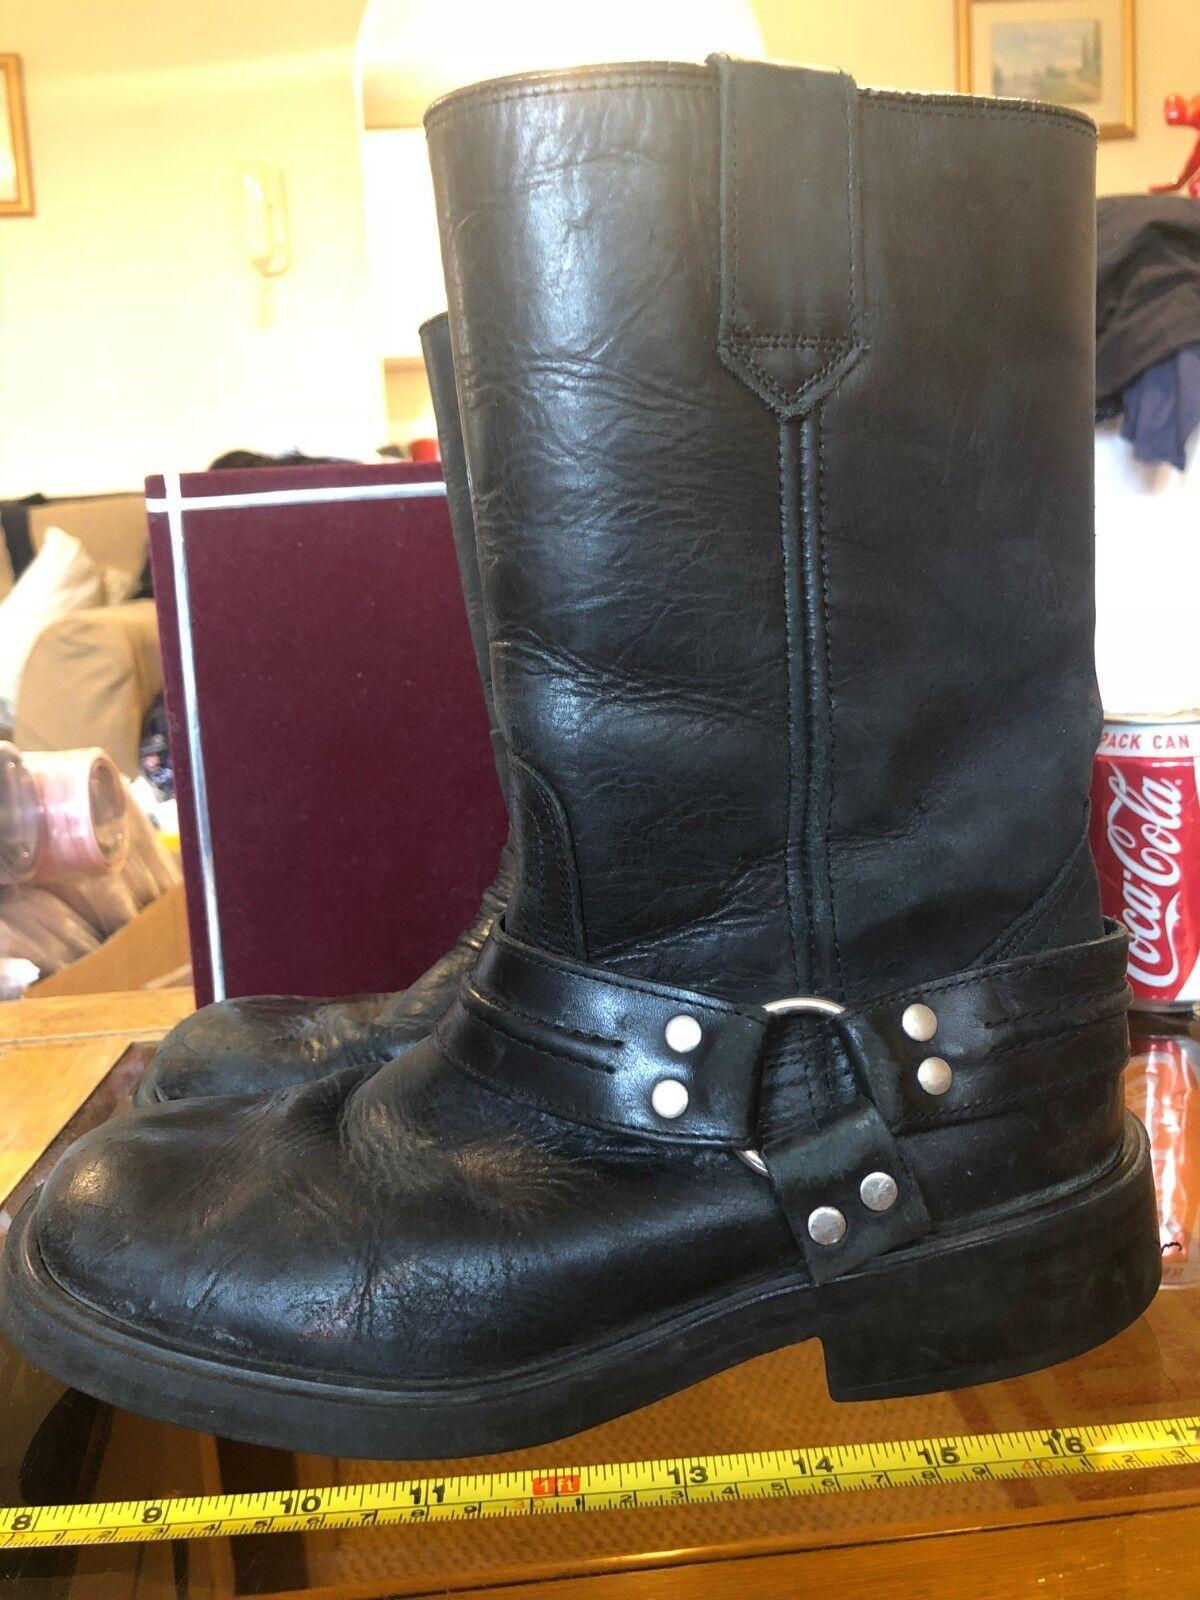 Suela De Goma Black Buckle Boots Horse Riding shoes UK 5 Europe 40 Used Women